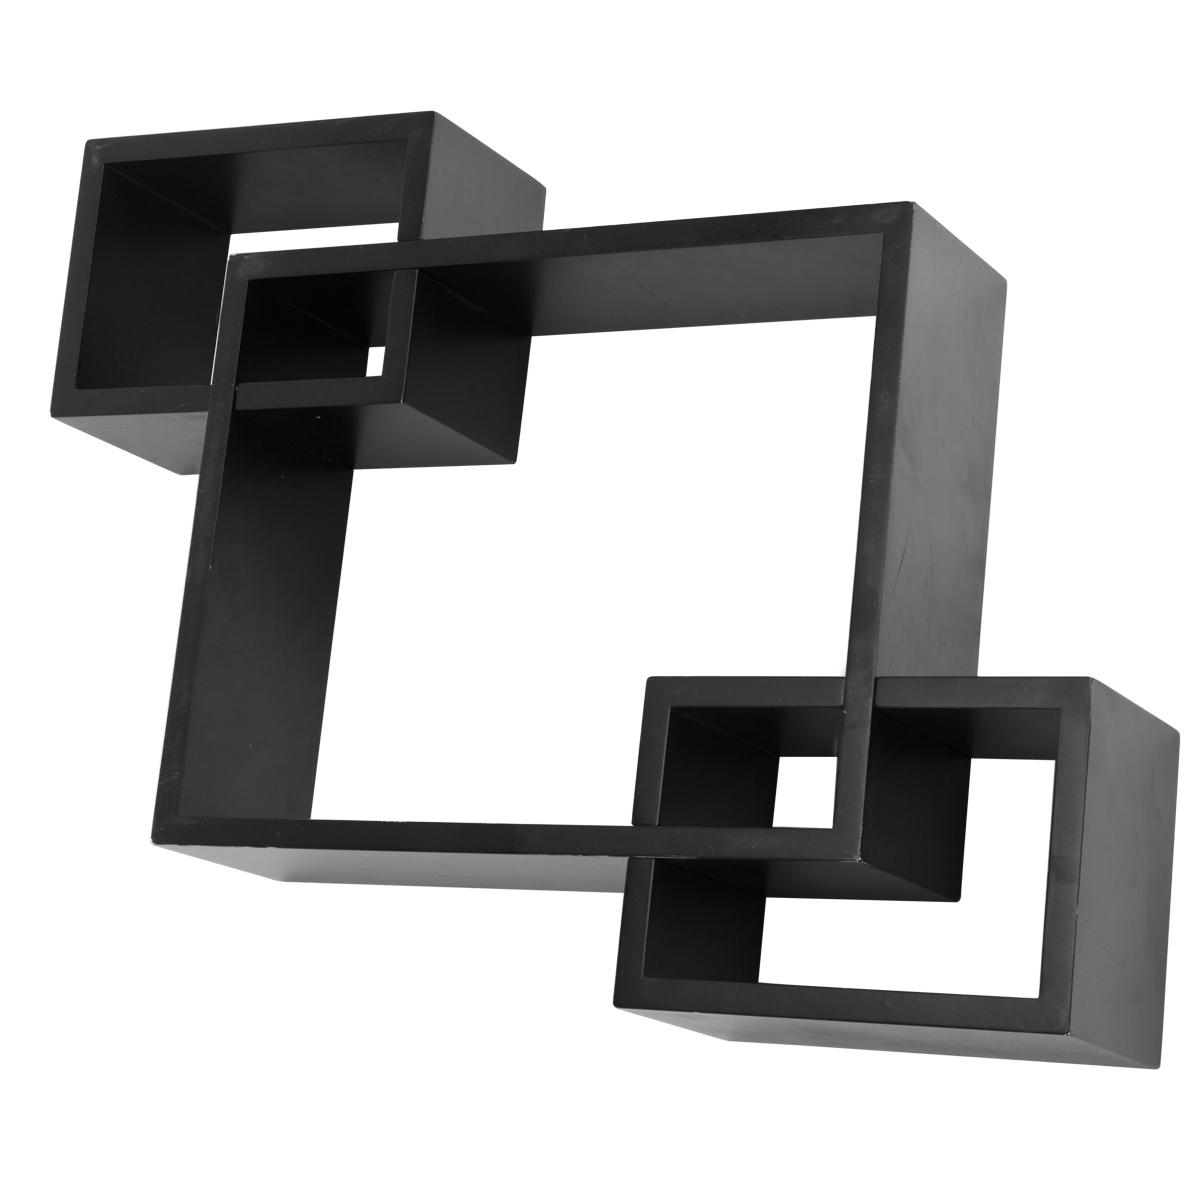 Black wall mounted shelves decor ideasdecor ideas - Wall mounted shelving ideas ...